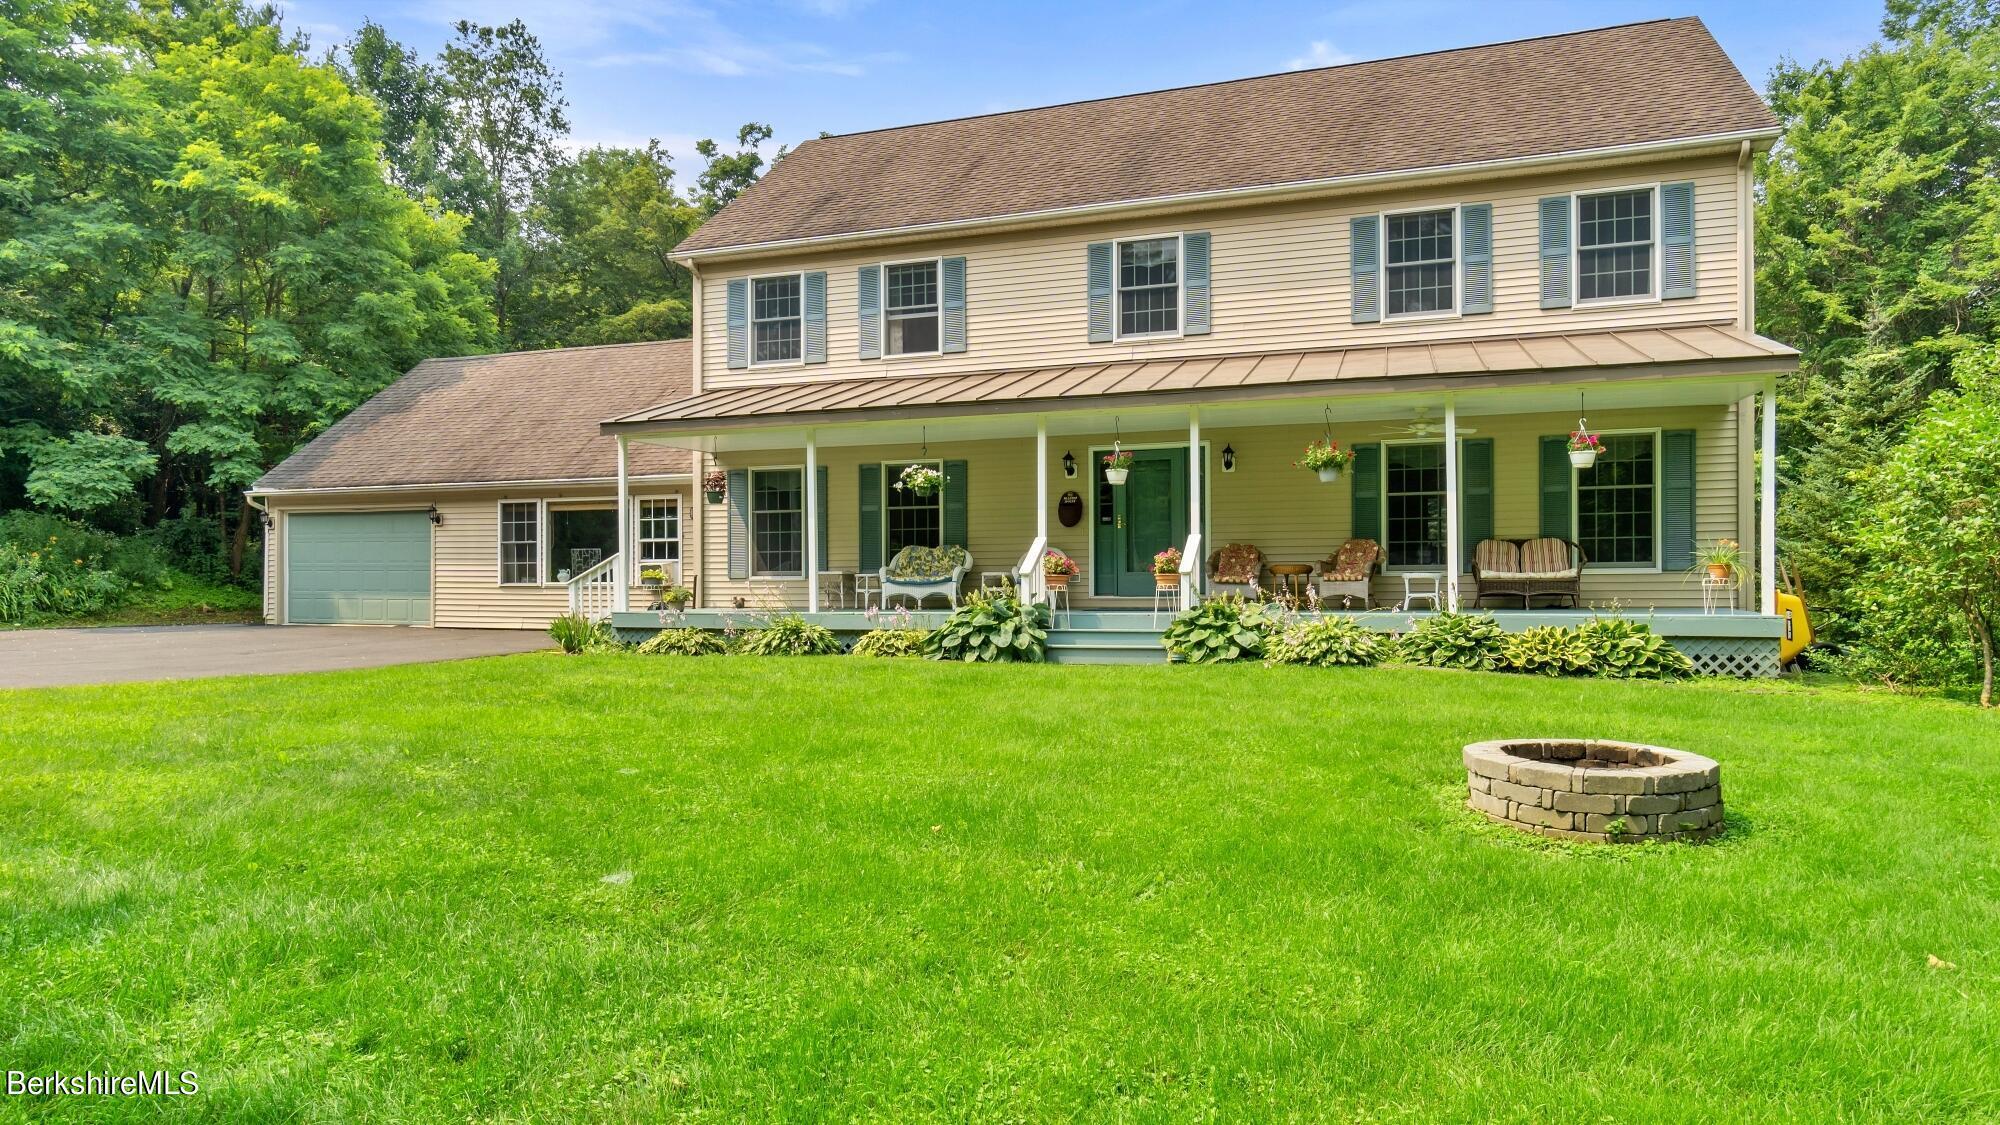 75 East, Lee, Massachusetts 01238, 4 Bedrooms Bedrooms, 8 Rooms Rooms,4 BathroomsBathrooms,Residential,For Sale,East,235216